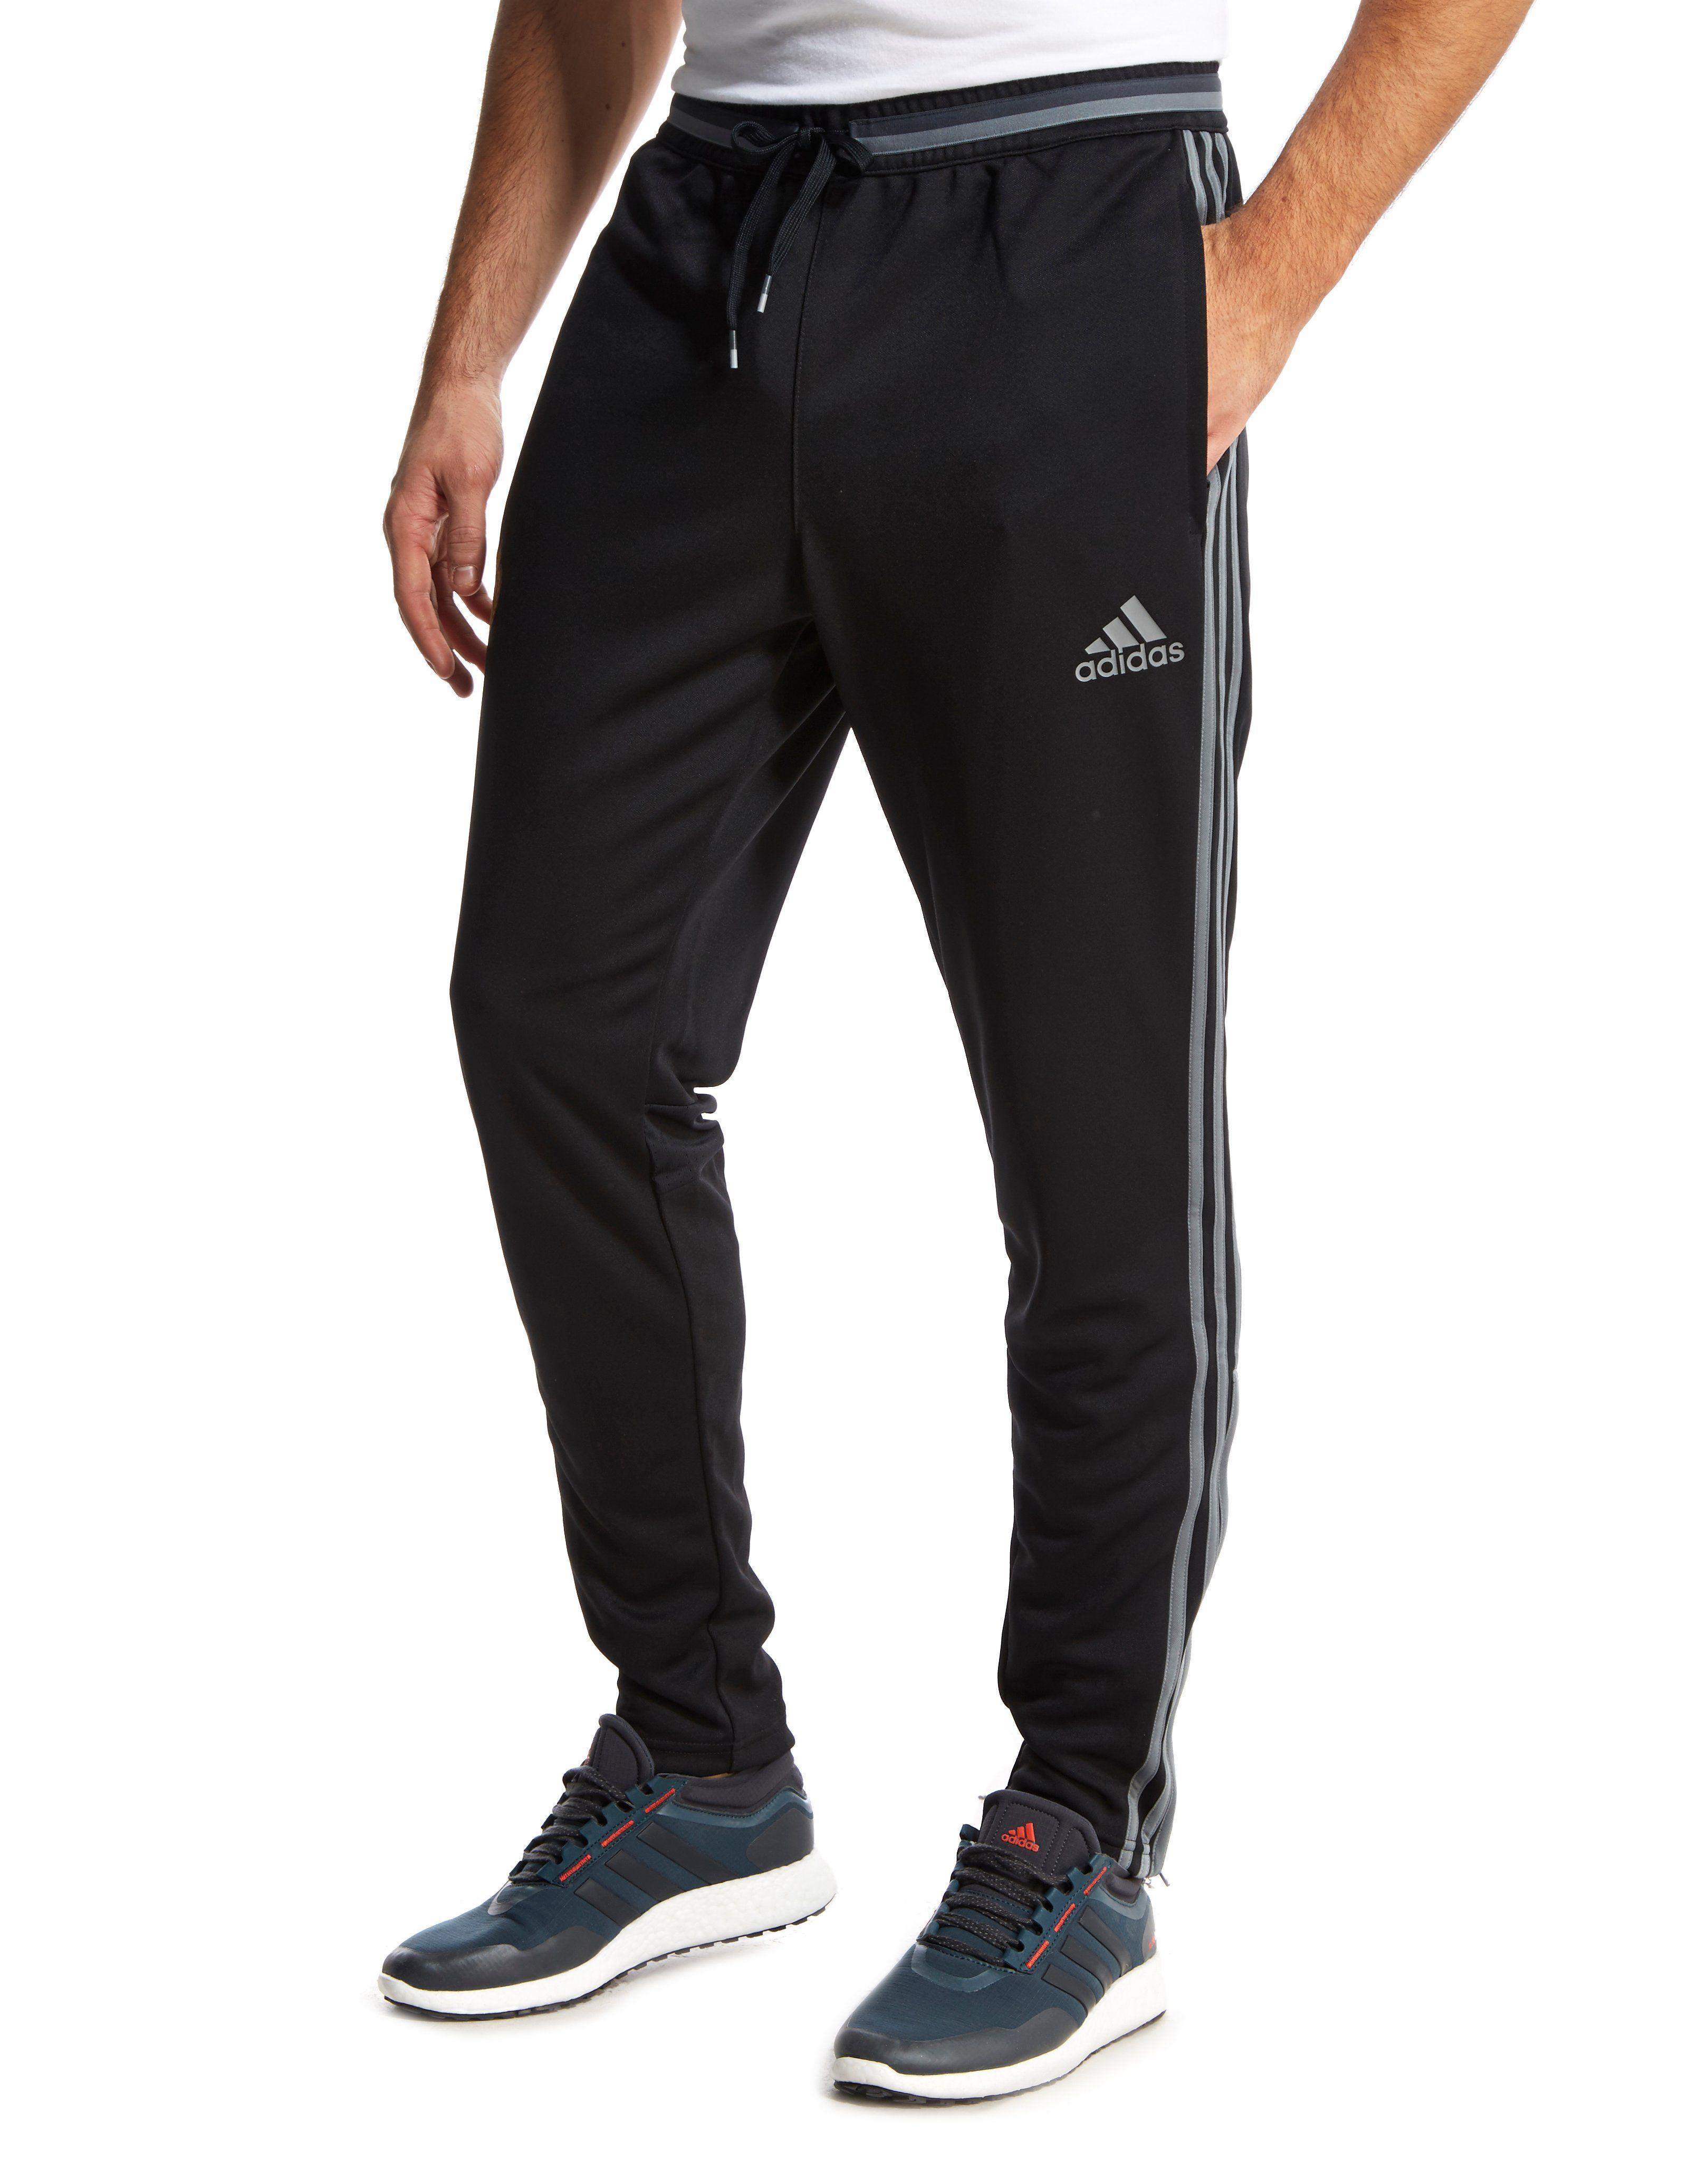 adidas belgium training pants jd sports. Black Bedroom Furniture Sets. Home Design Ideas